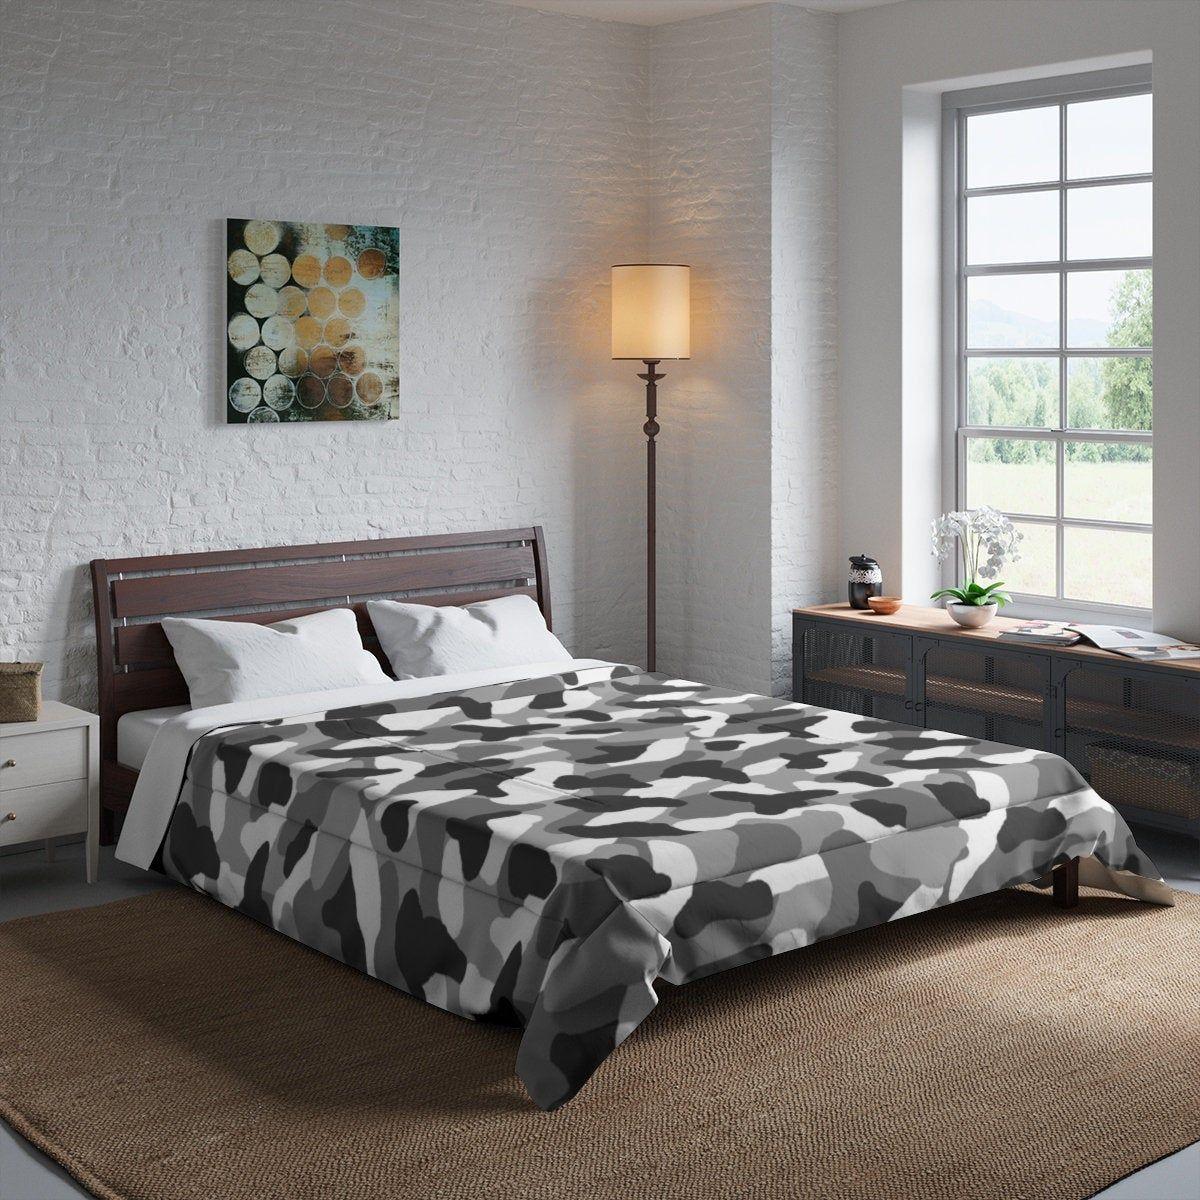 Gray Camo Comforter Bedding Blanket Grey Camouflage King Queen Full Twin Bed Kids Room Home Decor Rustic Farmho Bed Comforters Rooms Home Decor Kids Twin Bed